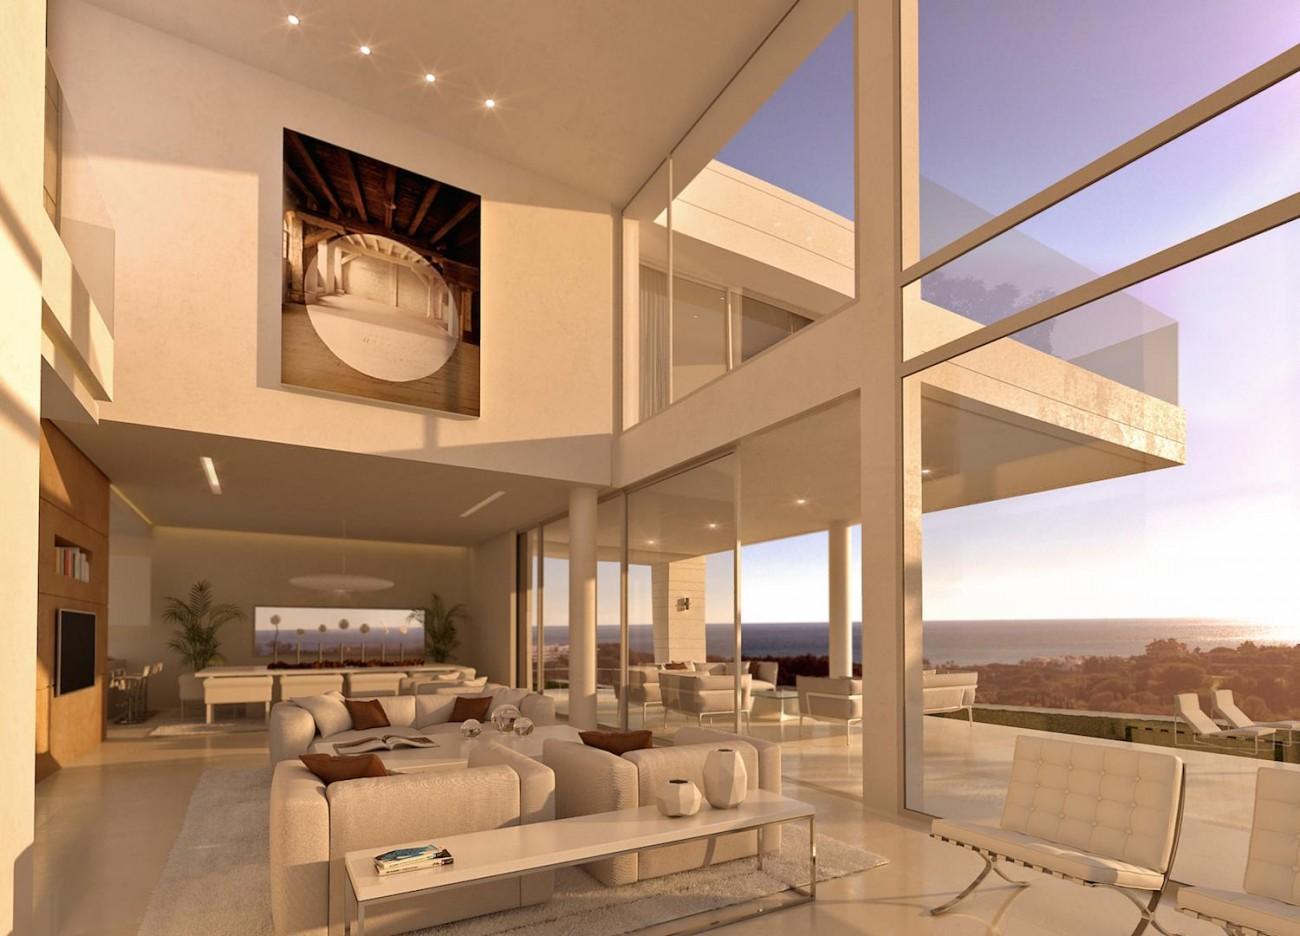 V5419 Luxury frontline golf villas 9 (Large)